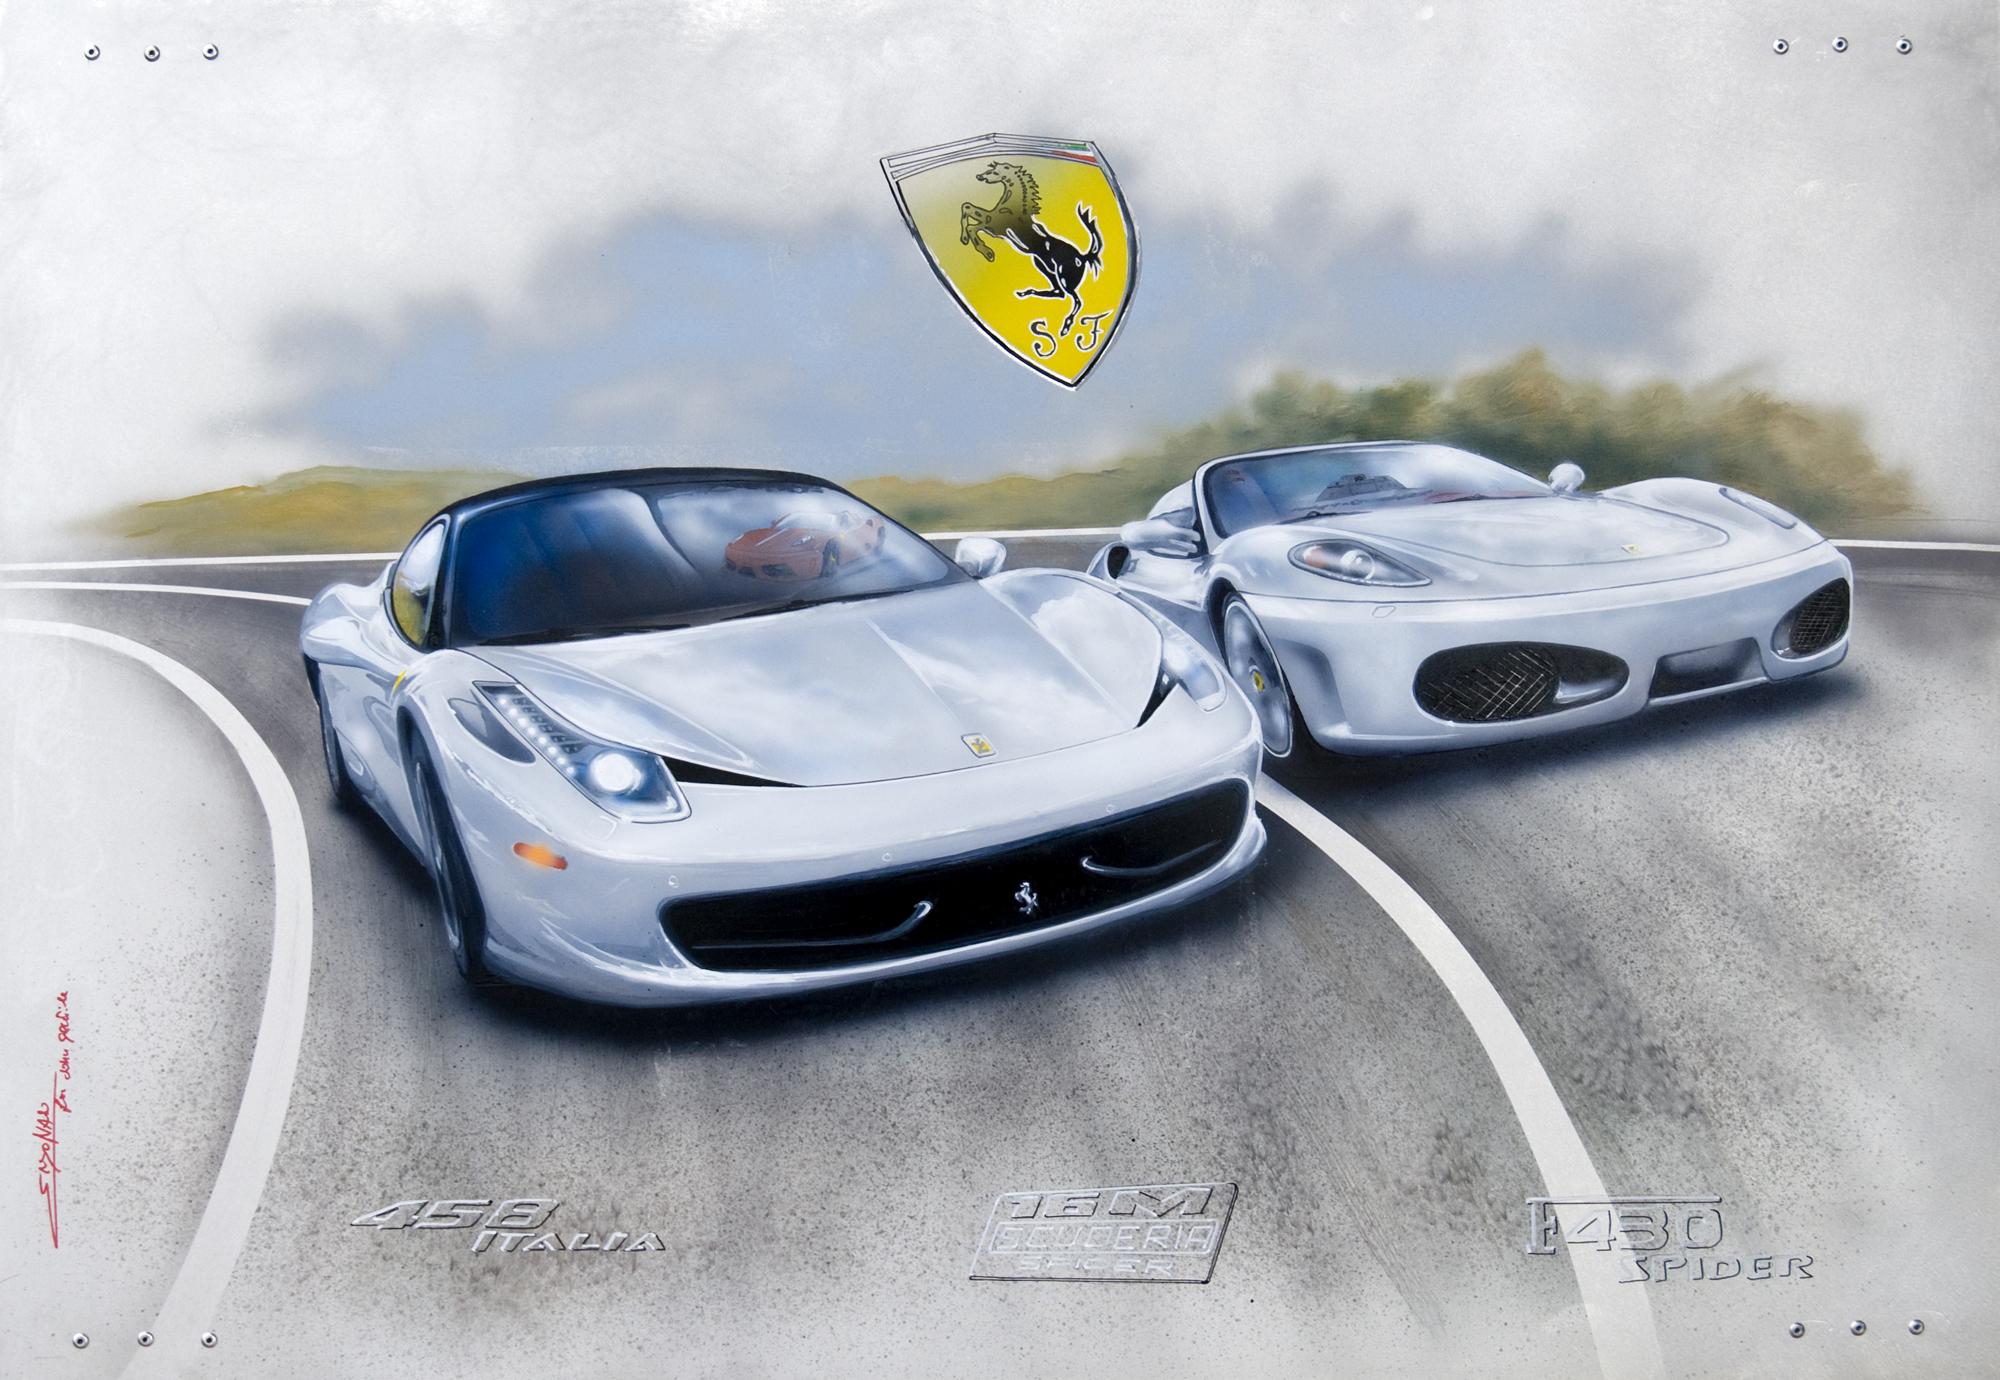 White Ferraris